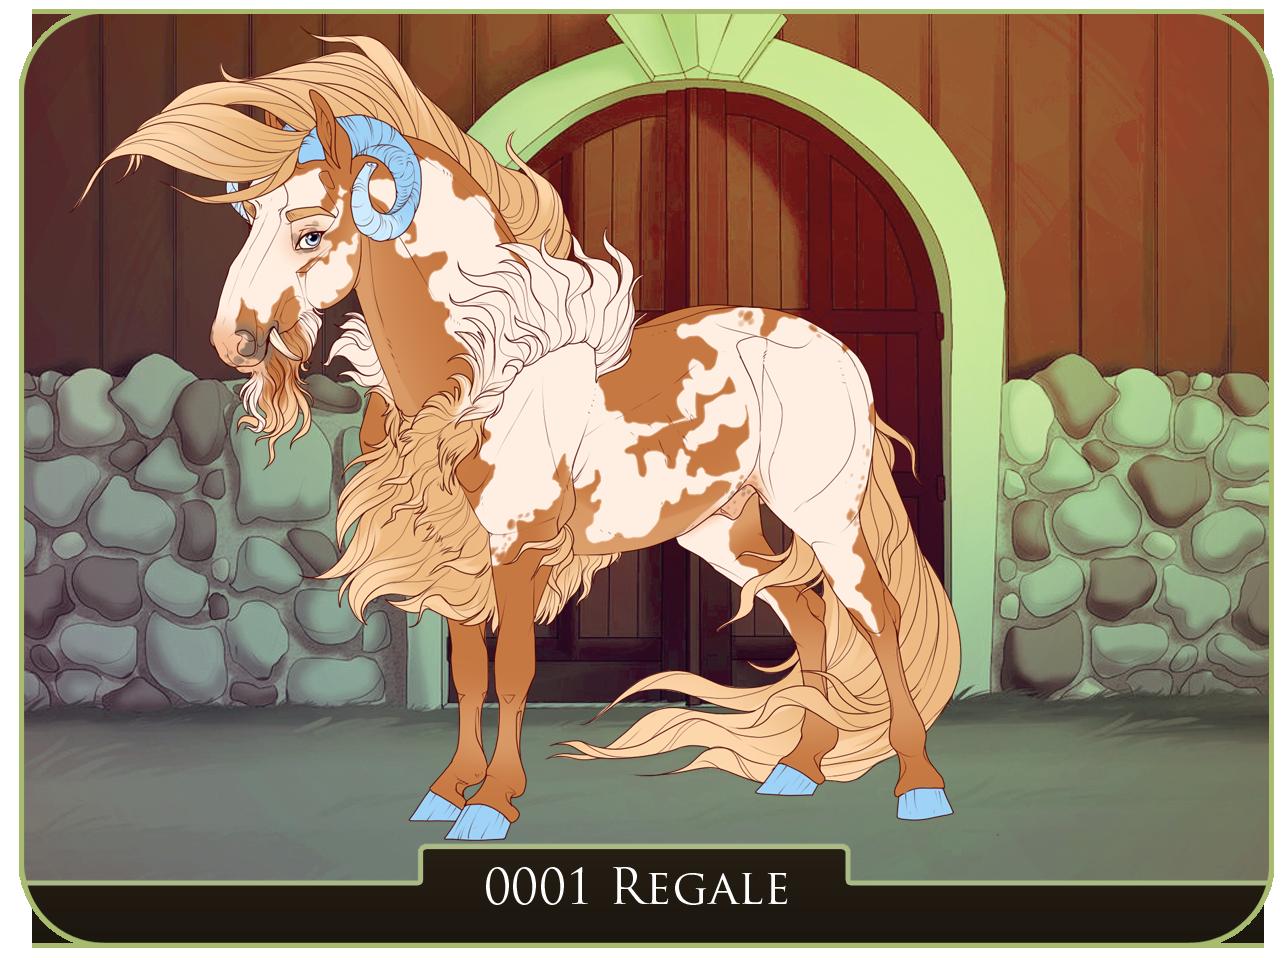 Mascot | 0001 | Regale